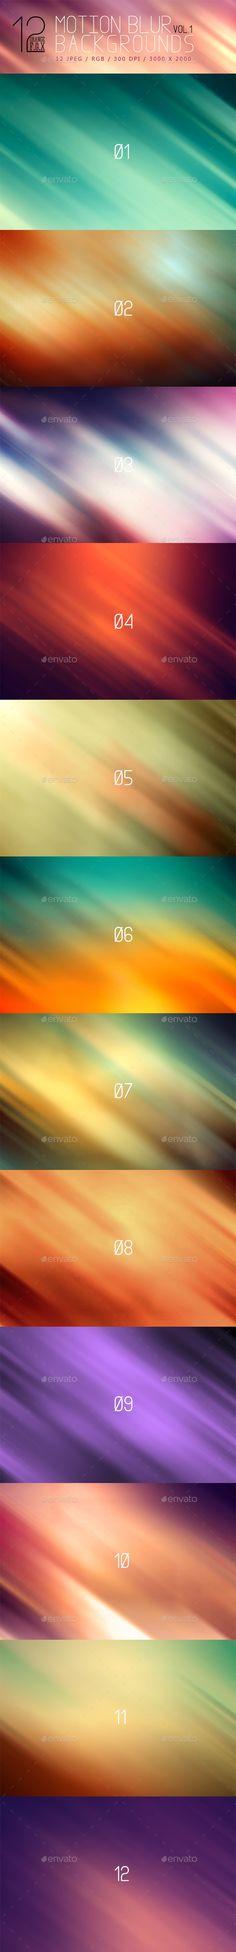 12 Motion Blur Backgrounds VOL.1   #abstract #amazing #background #blurbackground #business #clean background #color #light background #modern background #motion #motion blur #pattern #retro #Soft vintage #texture #vintage #website background